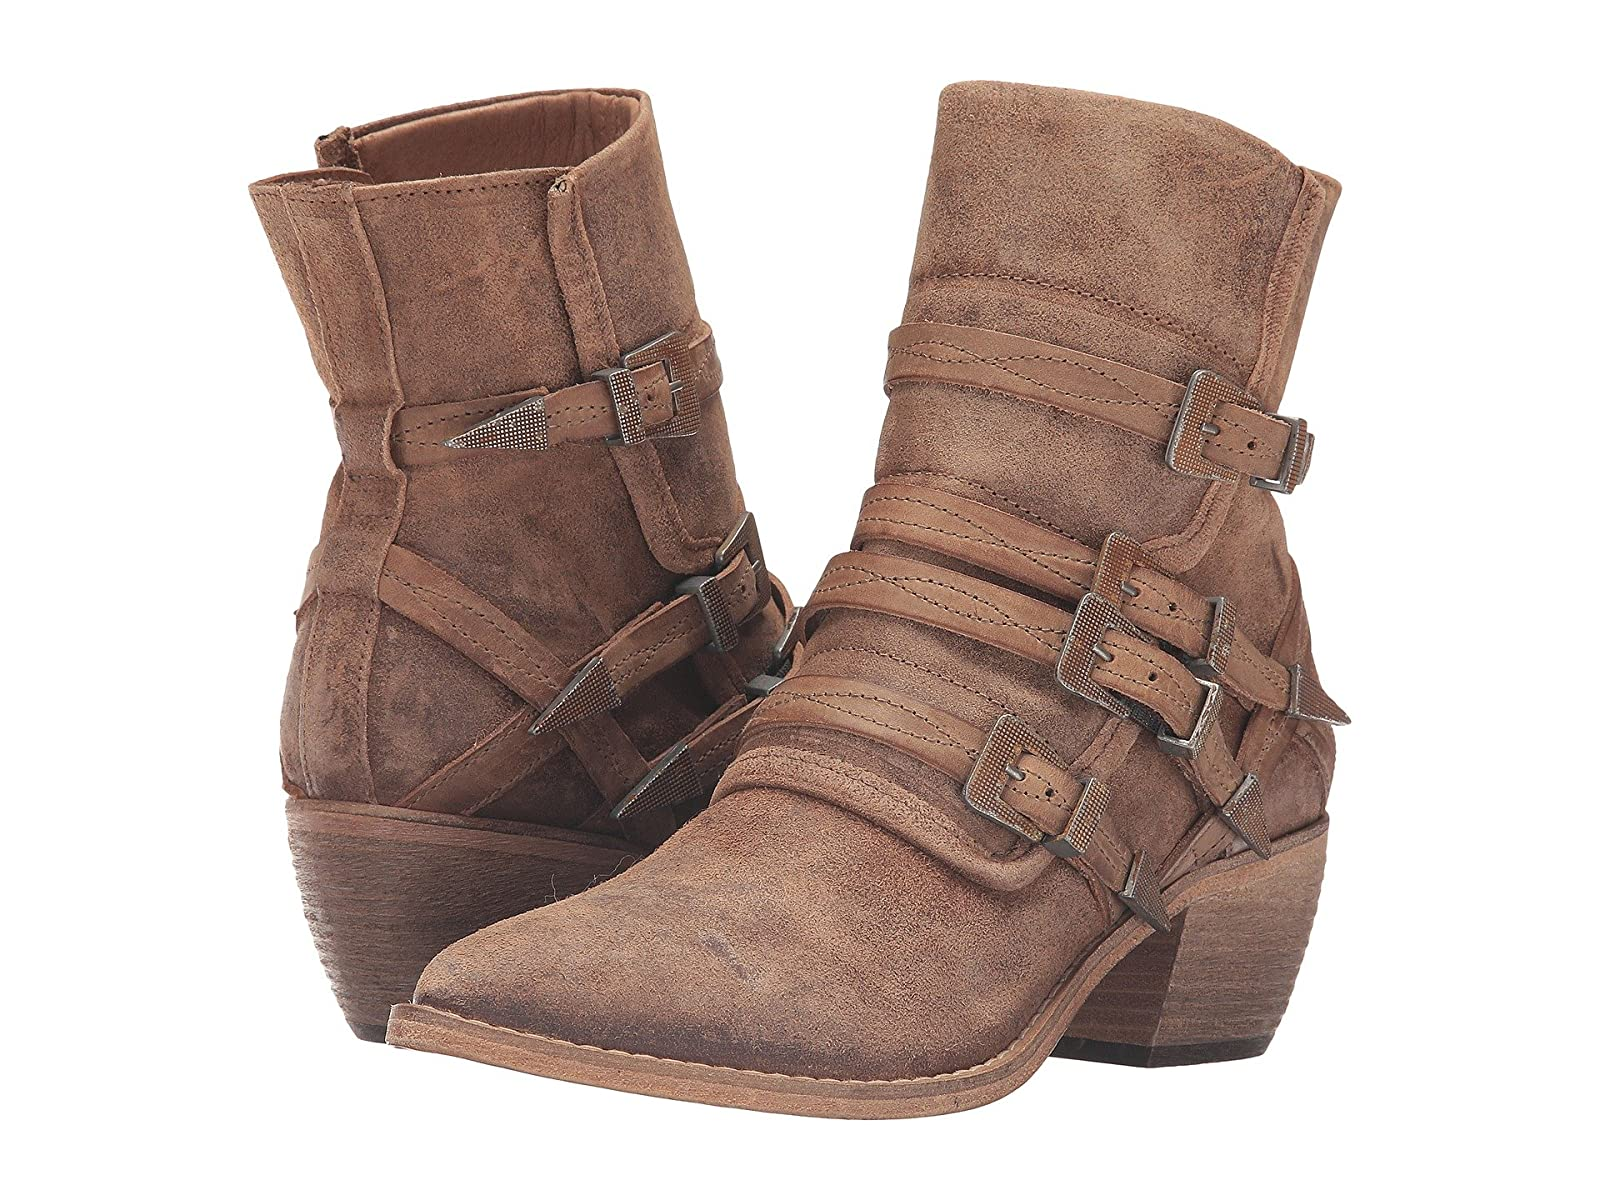 Free People Mason Western BootCheap and distinctive eye-catching shoes